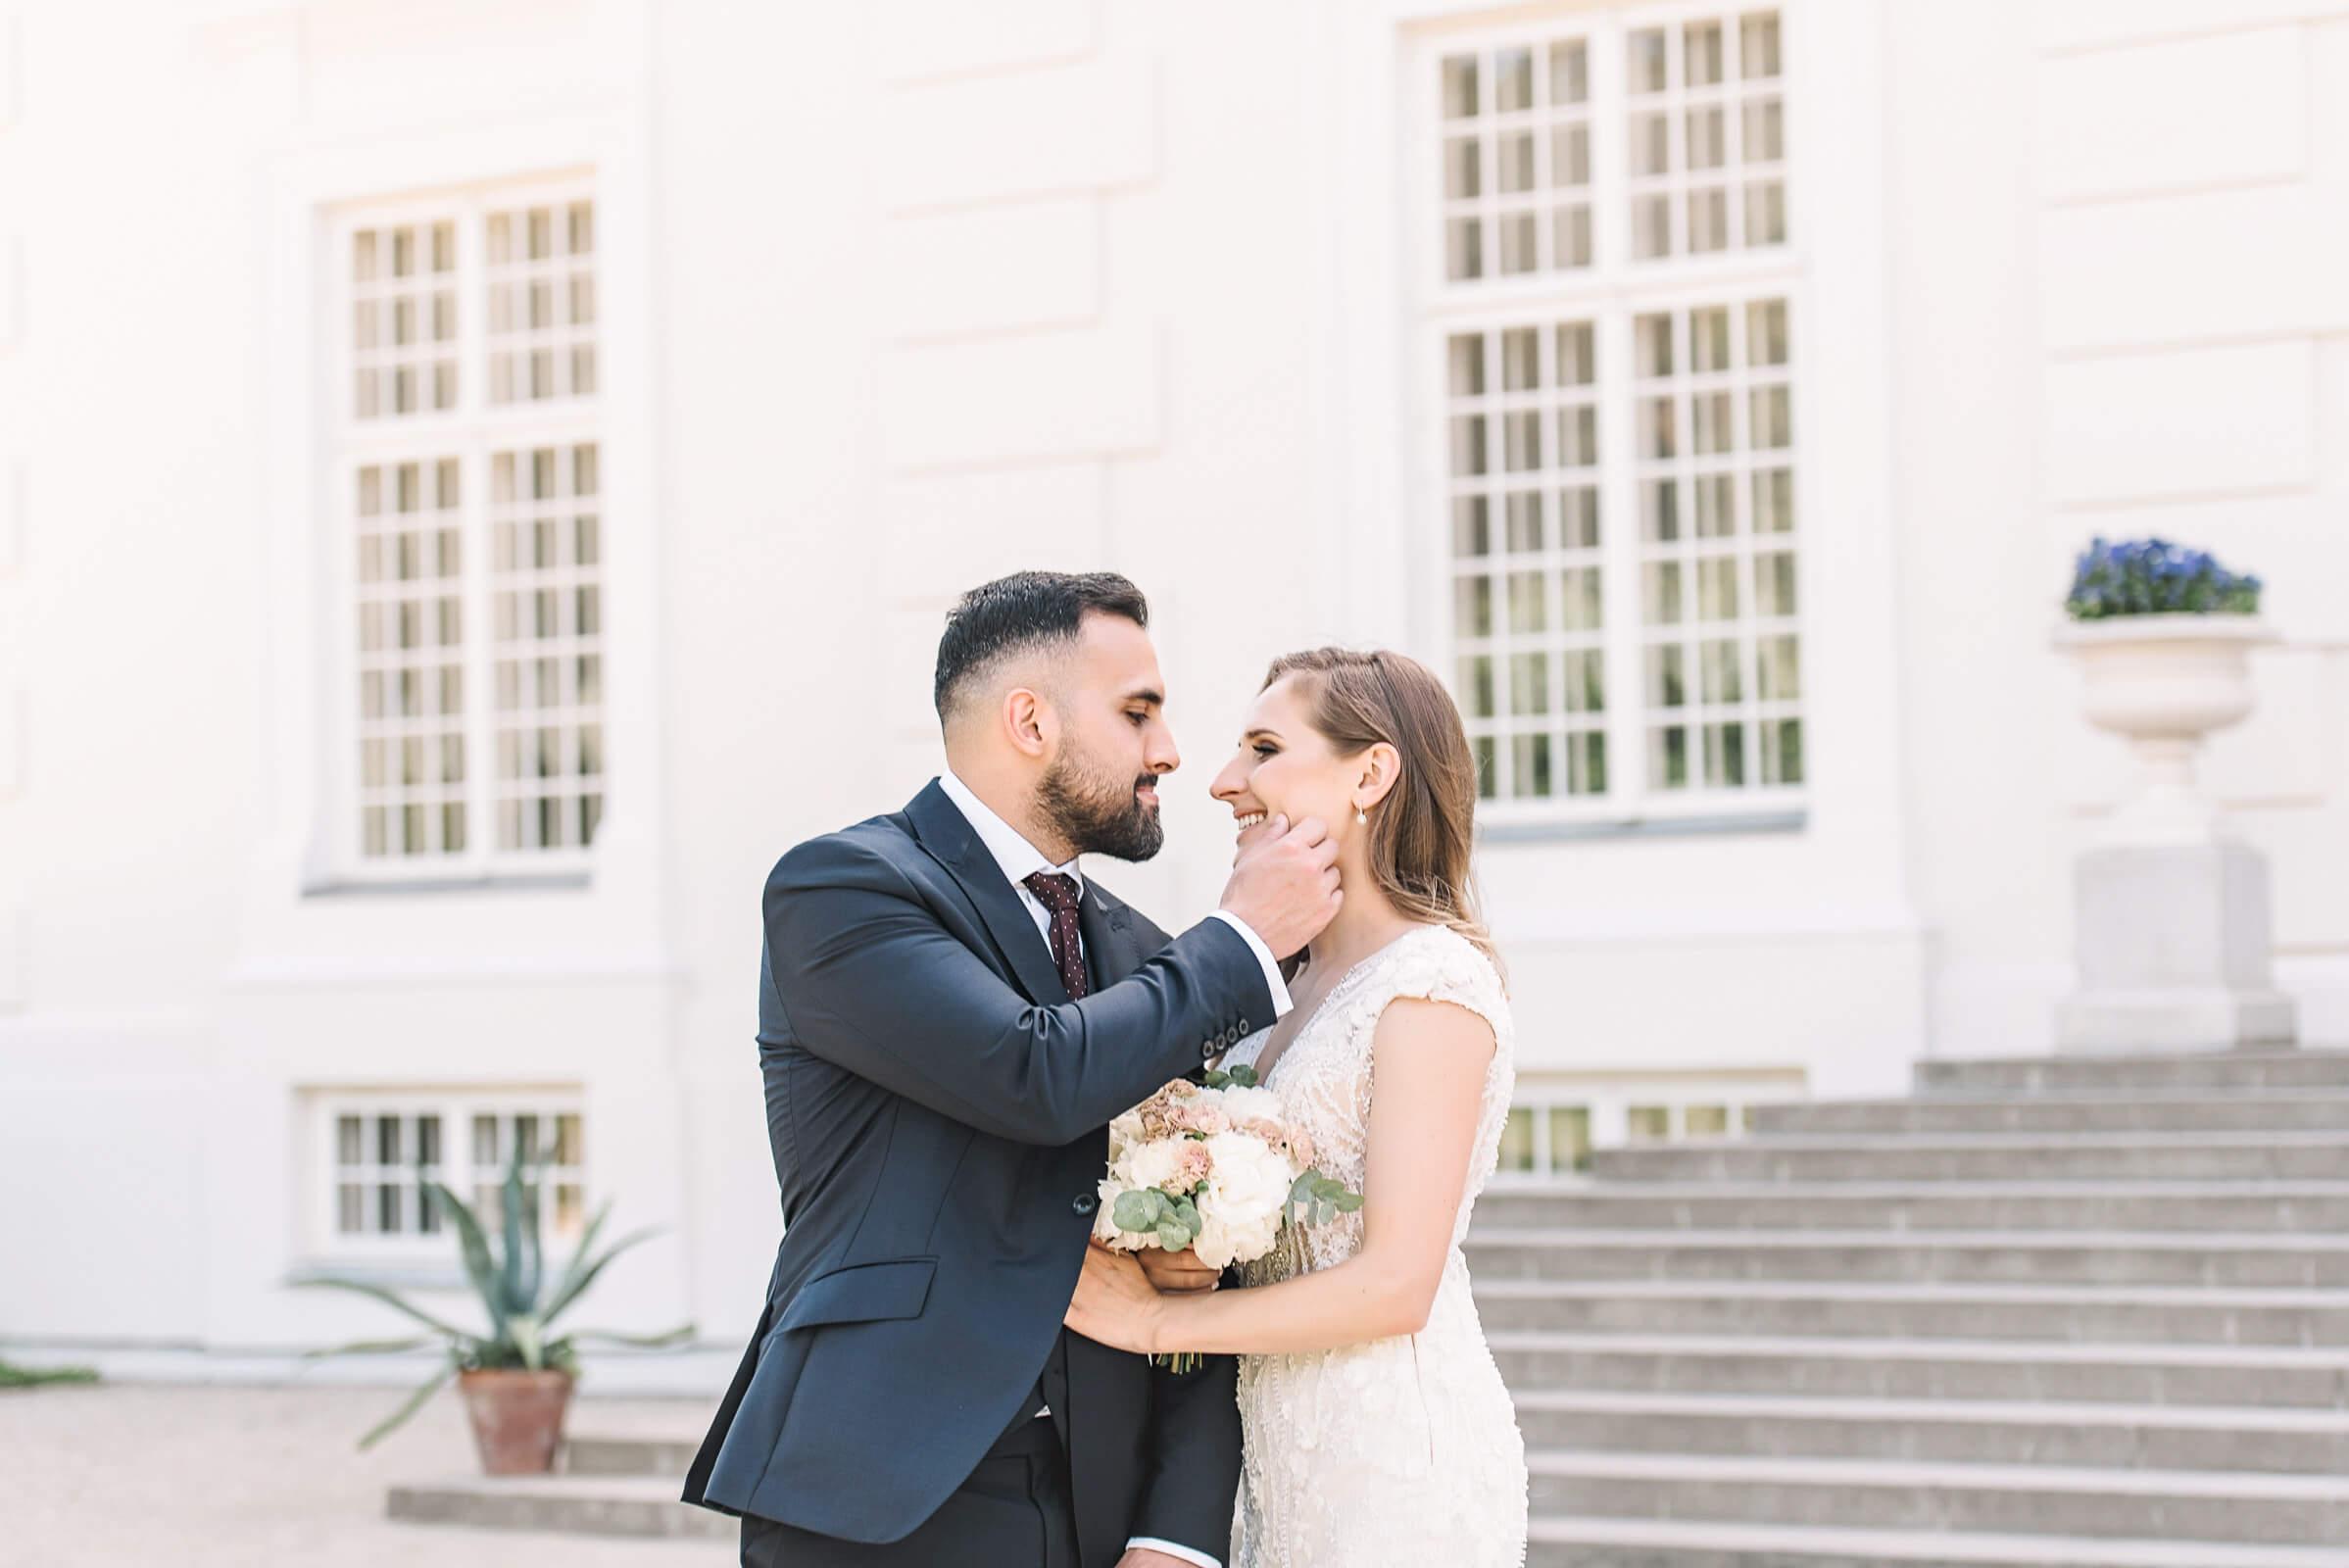 Vestuviu fotosesija Uzutrakio dvare